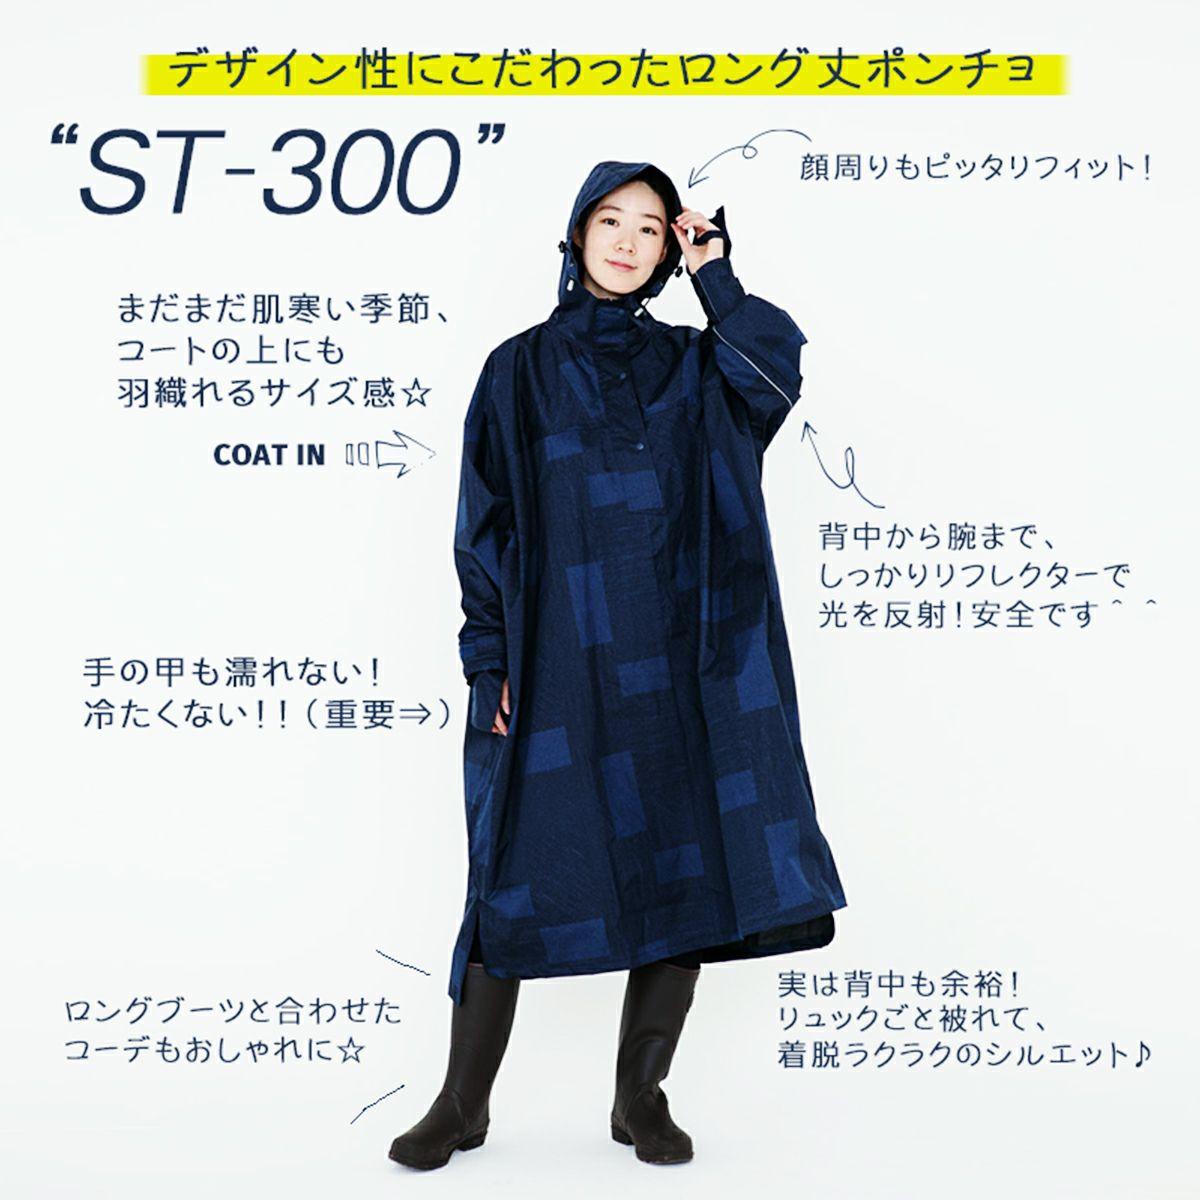 ST-300 特徴と概要説明